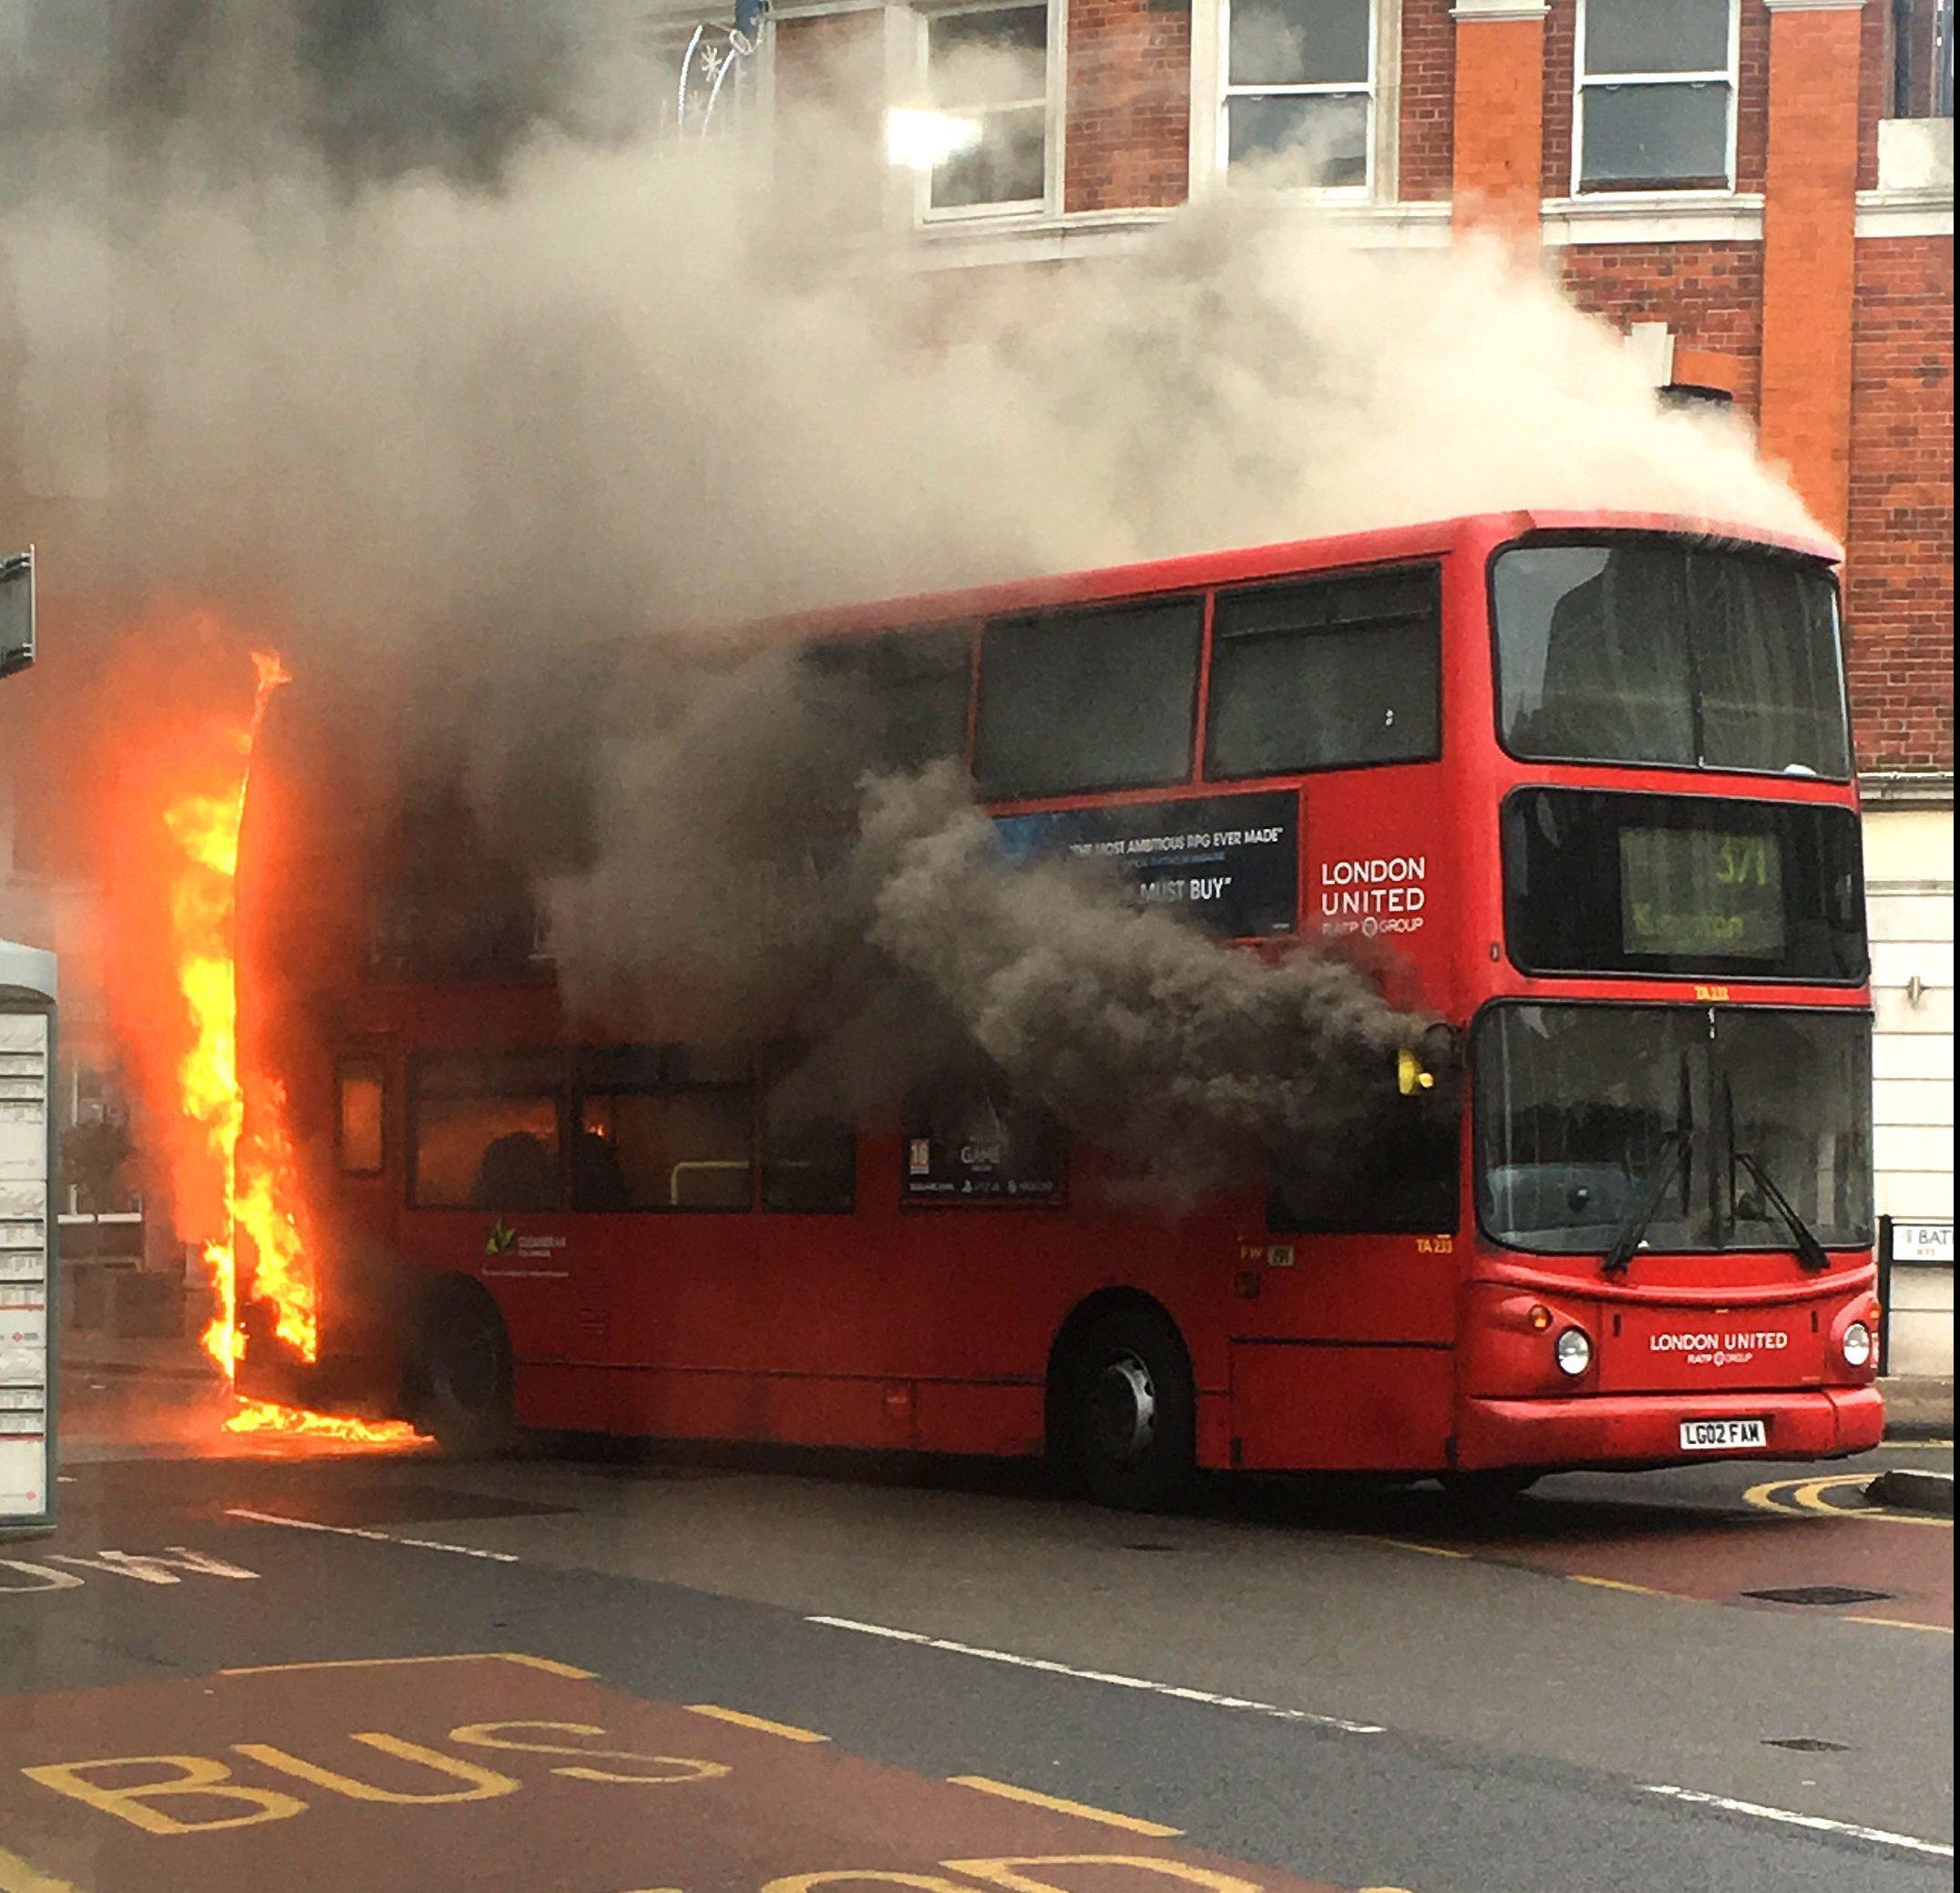 A bus on fire in Kingston, south west London.